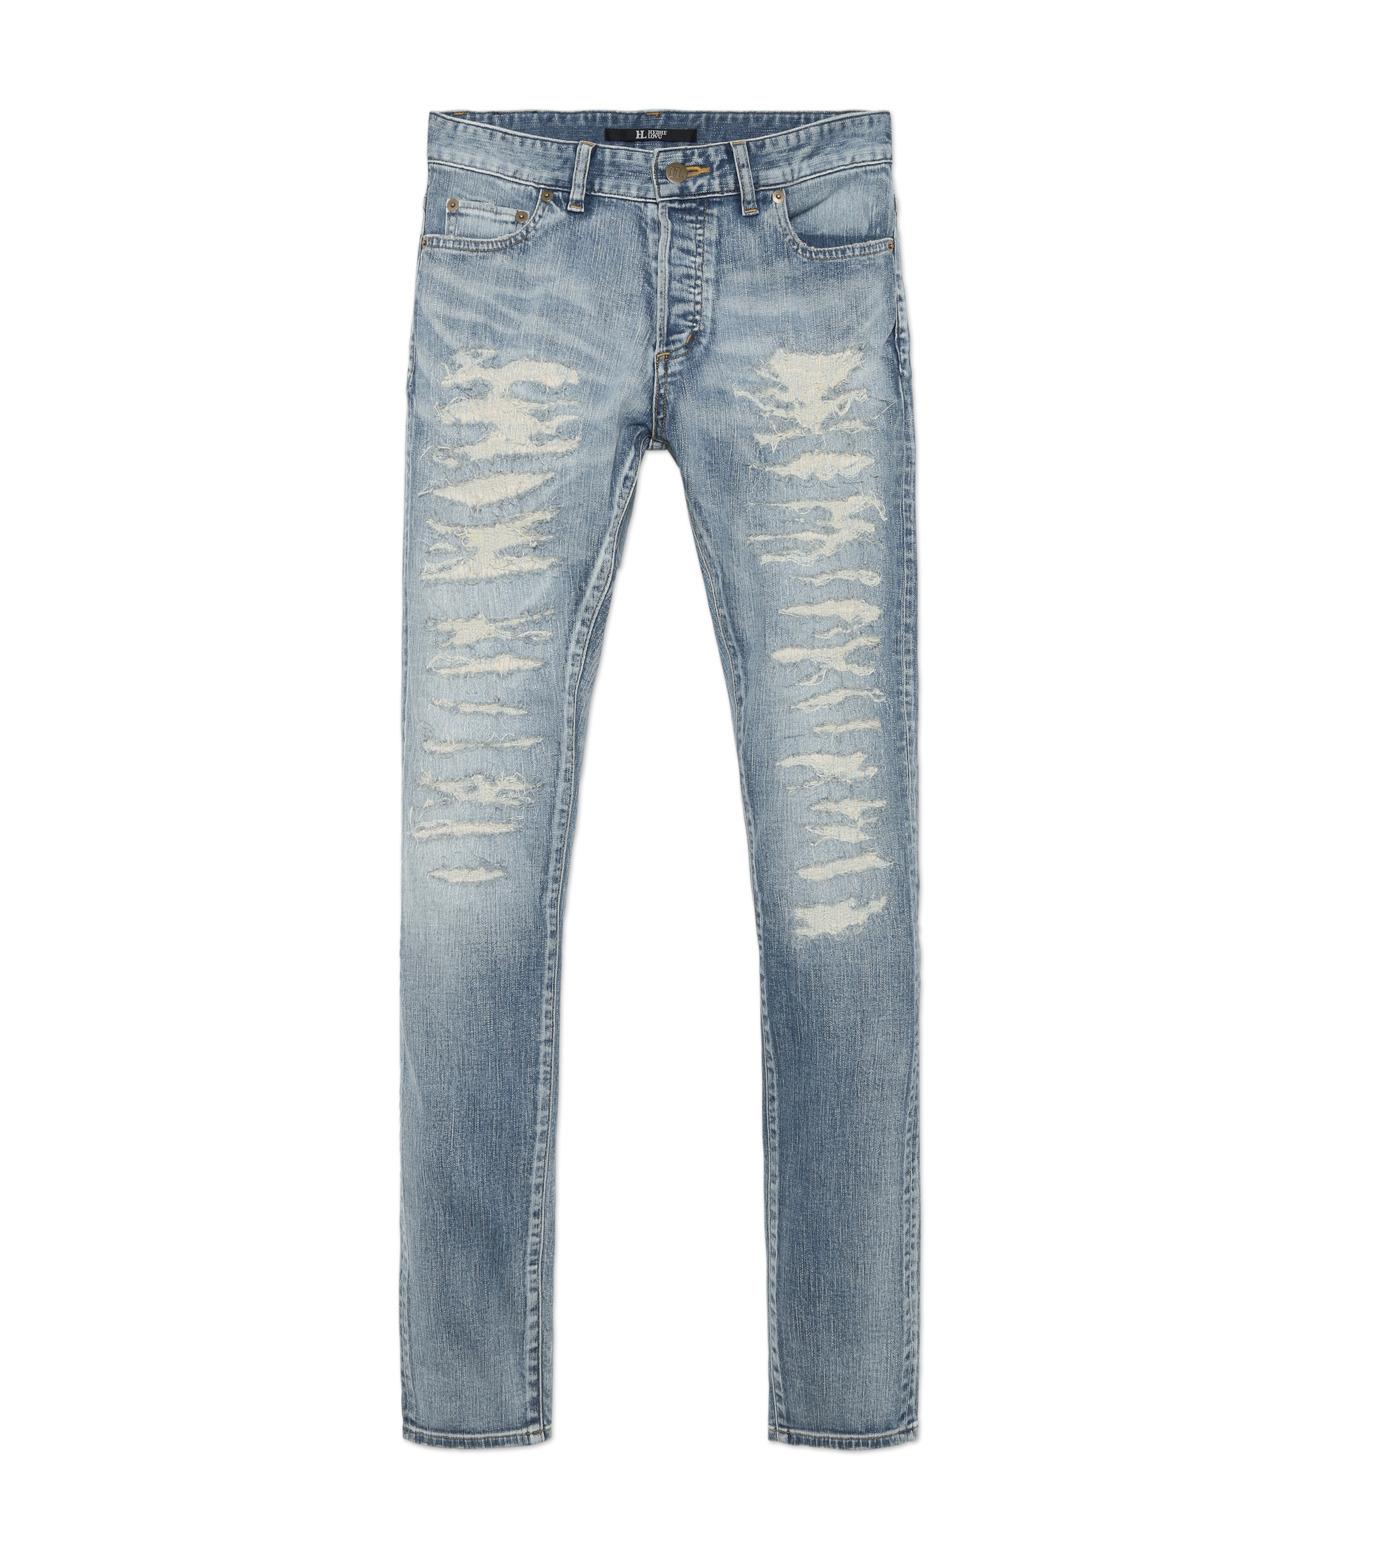 HL HEDDIE LOVU(エイチエル・エディールーヴ)のind damage3 skin slim-BLUE(パンツ/pants)-18S98002-92 拡大詳細画像4